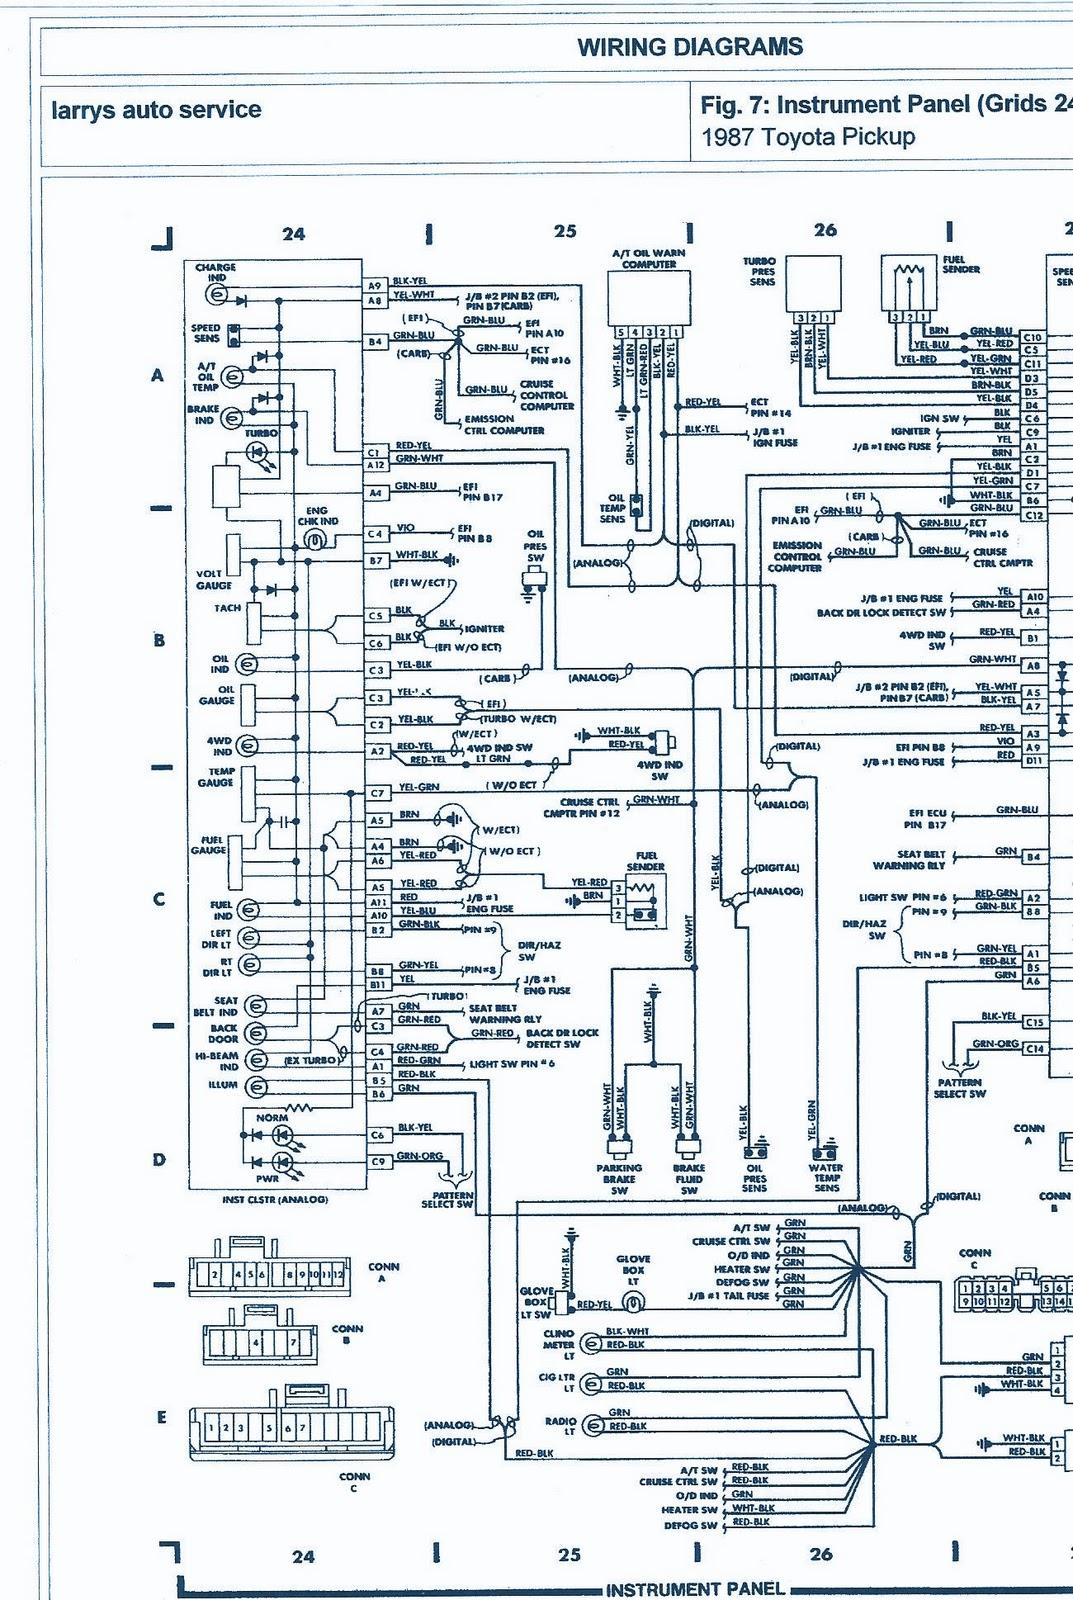 1988 Toyota Wiring Diagram Wiring Diagram Web A Web A Reteimpresesabina It